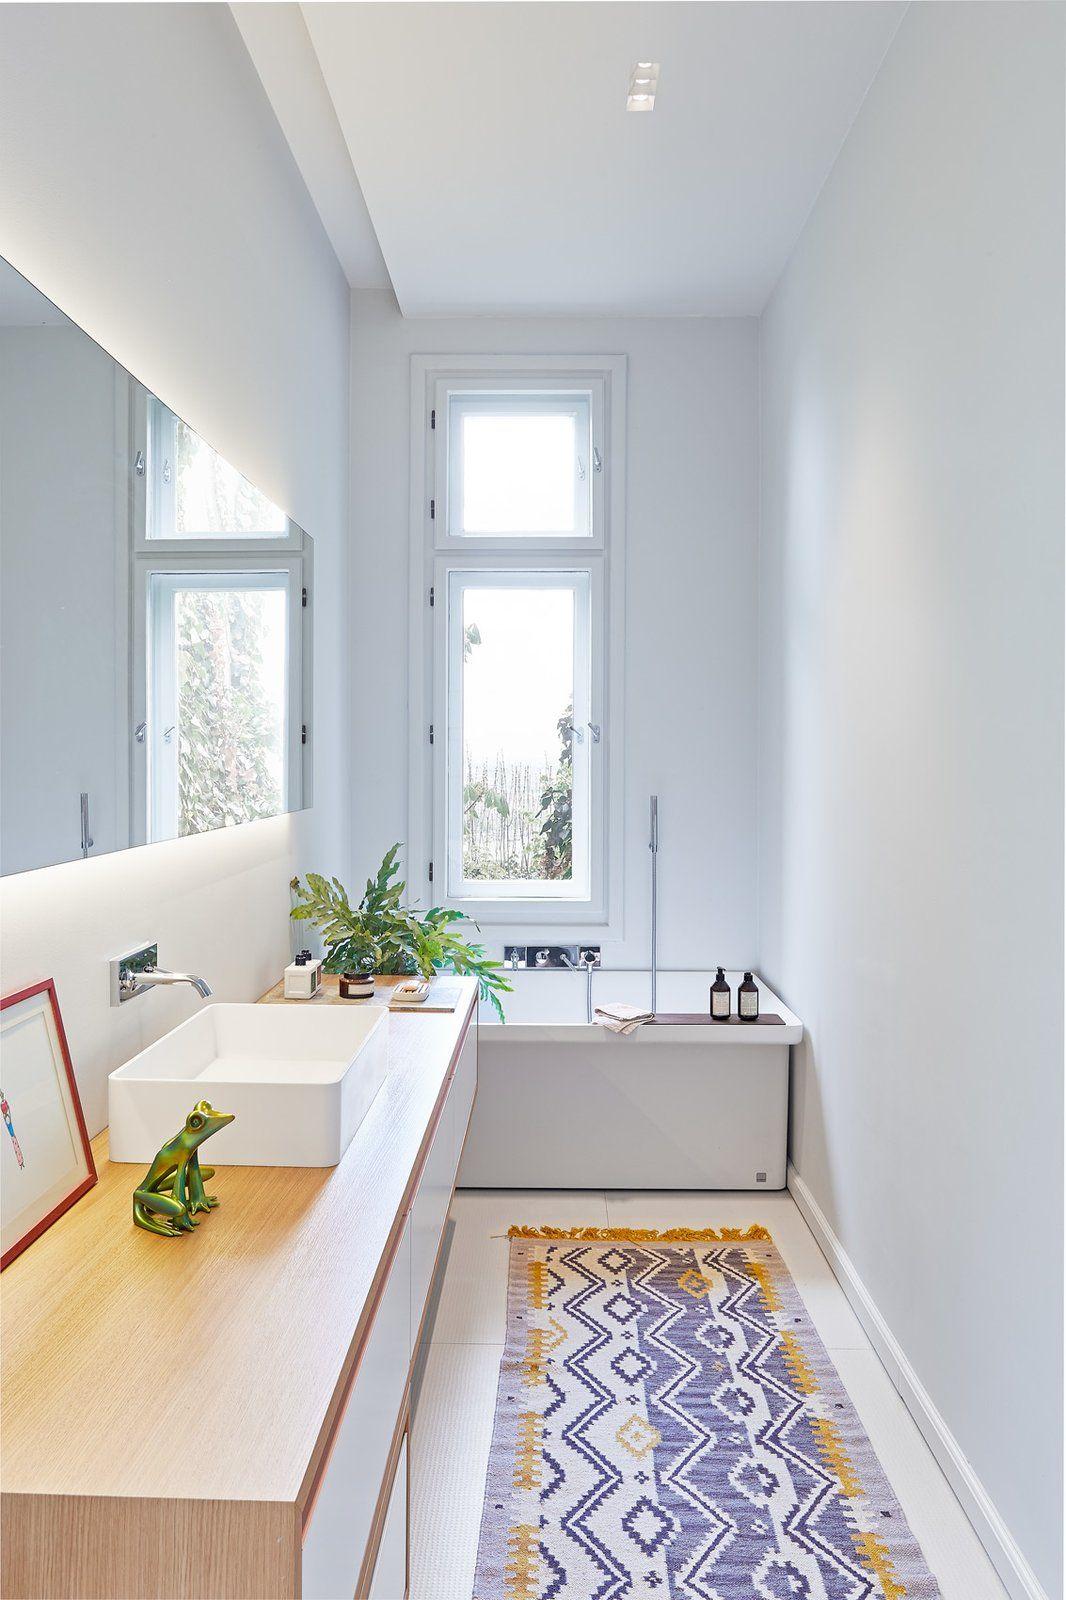 Pin by Kirsten Fordyce-Wheeler on the perfect bath   Pinterest   Bath